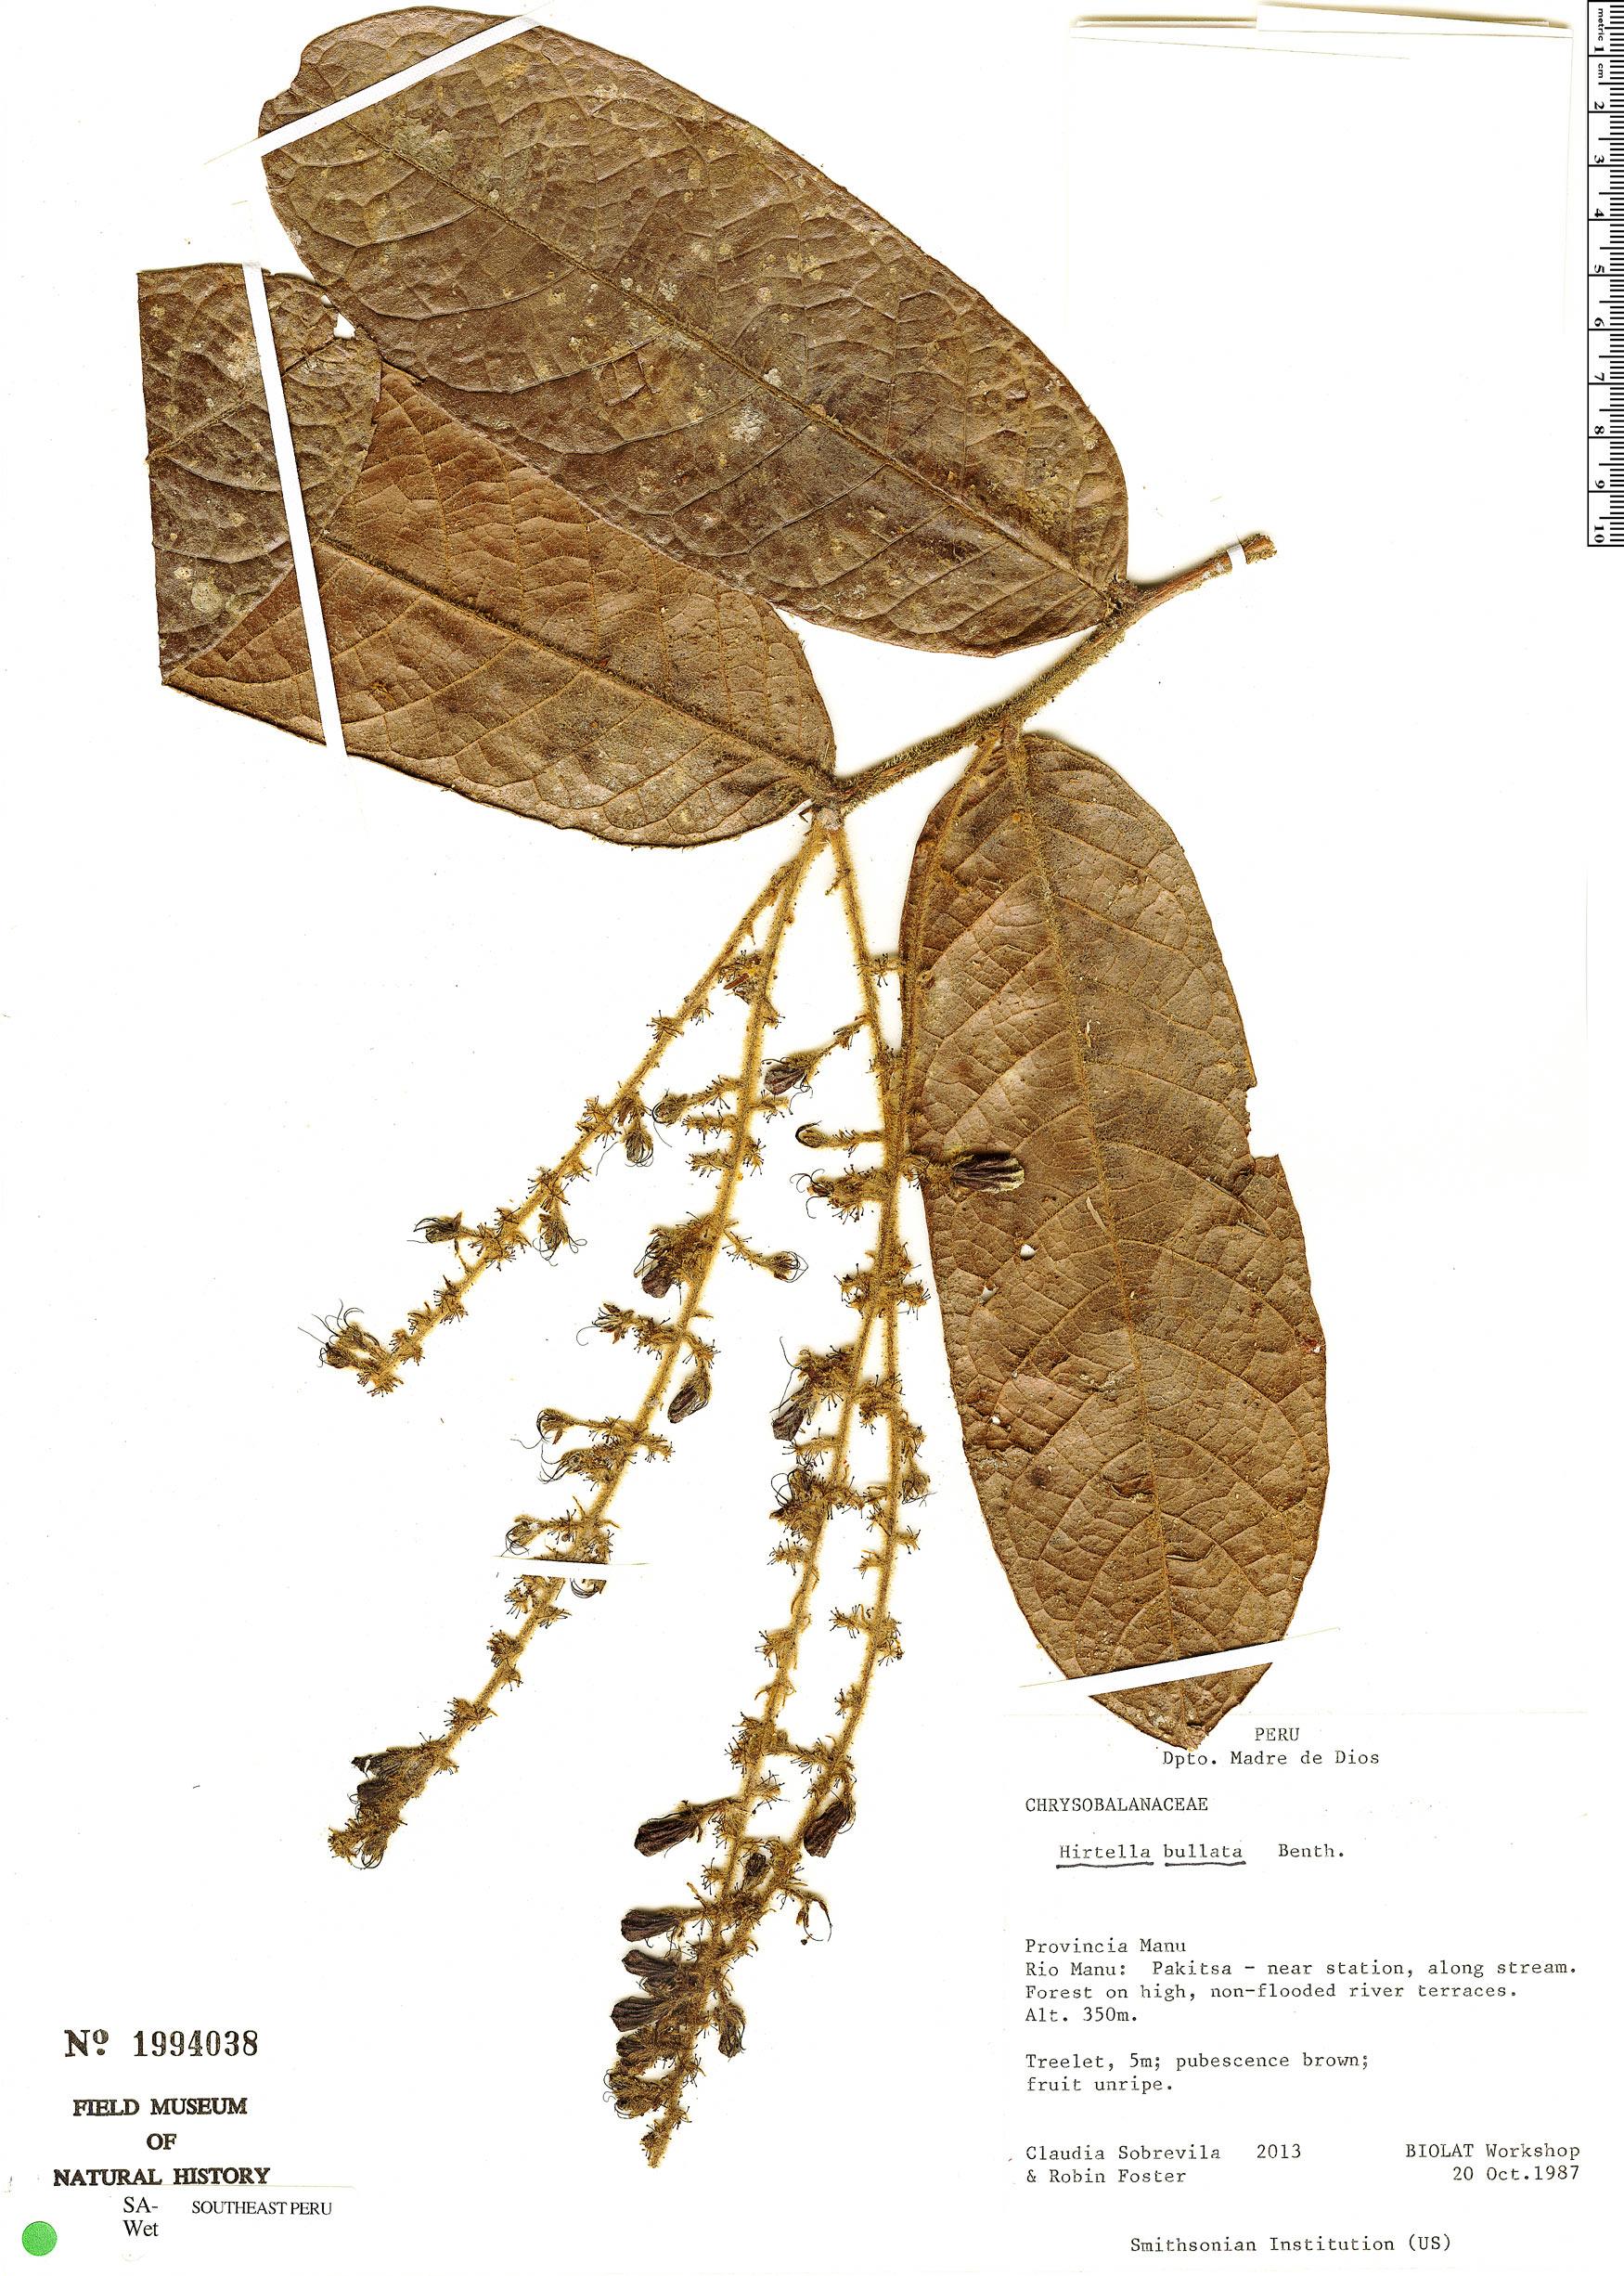 Specimen: Hirtella bullata